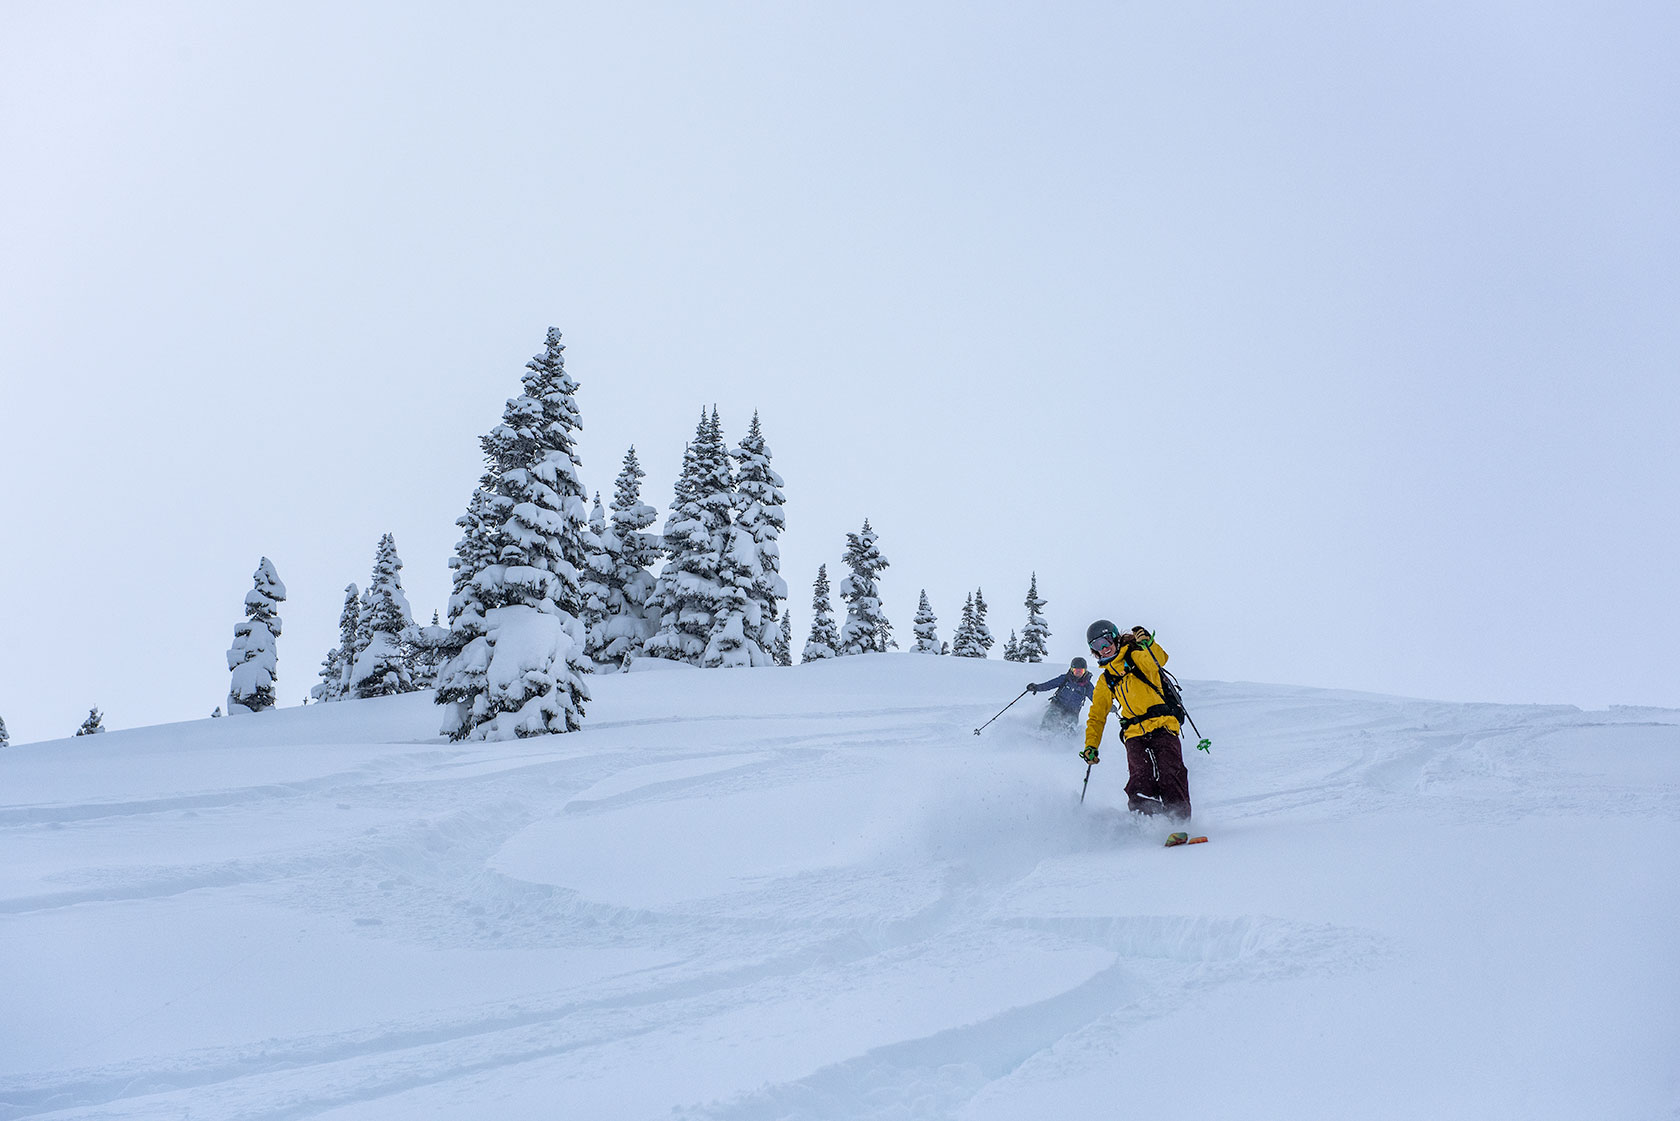 austin-trigg-patagonia-banff-alberta-winter-canada-lifestyle-adventure-mountains-backcountry-skiing-touring-trees.jpg